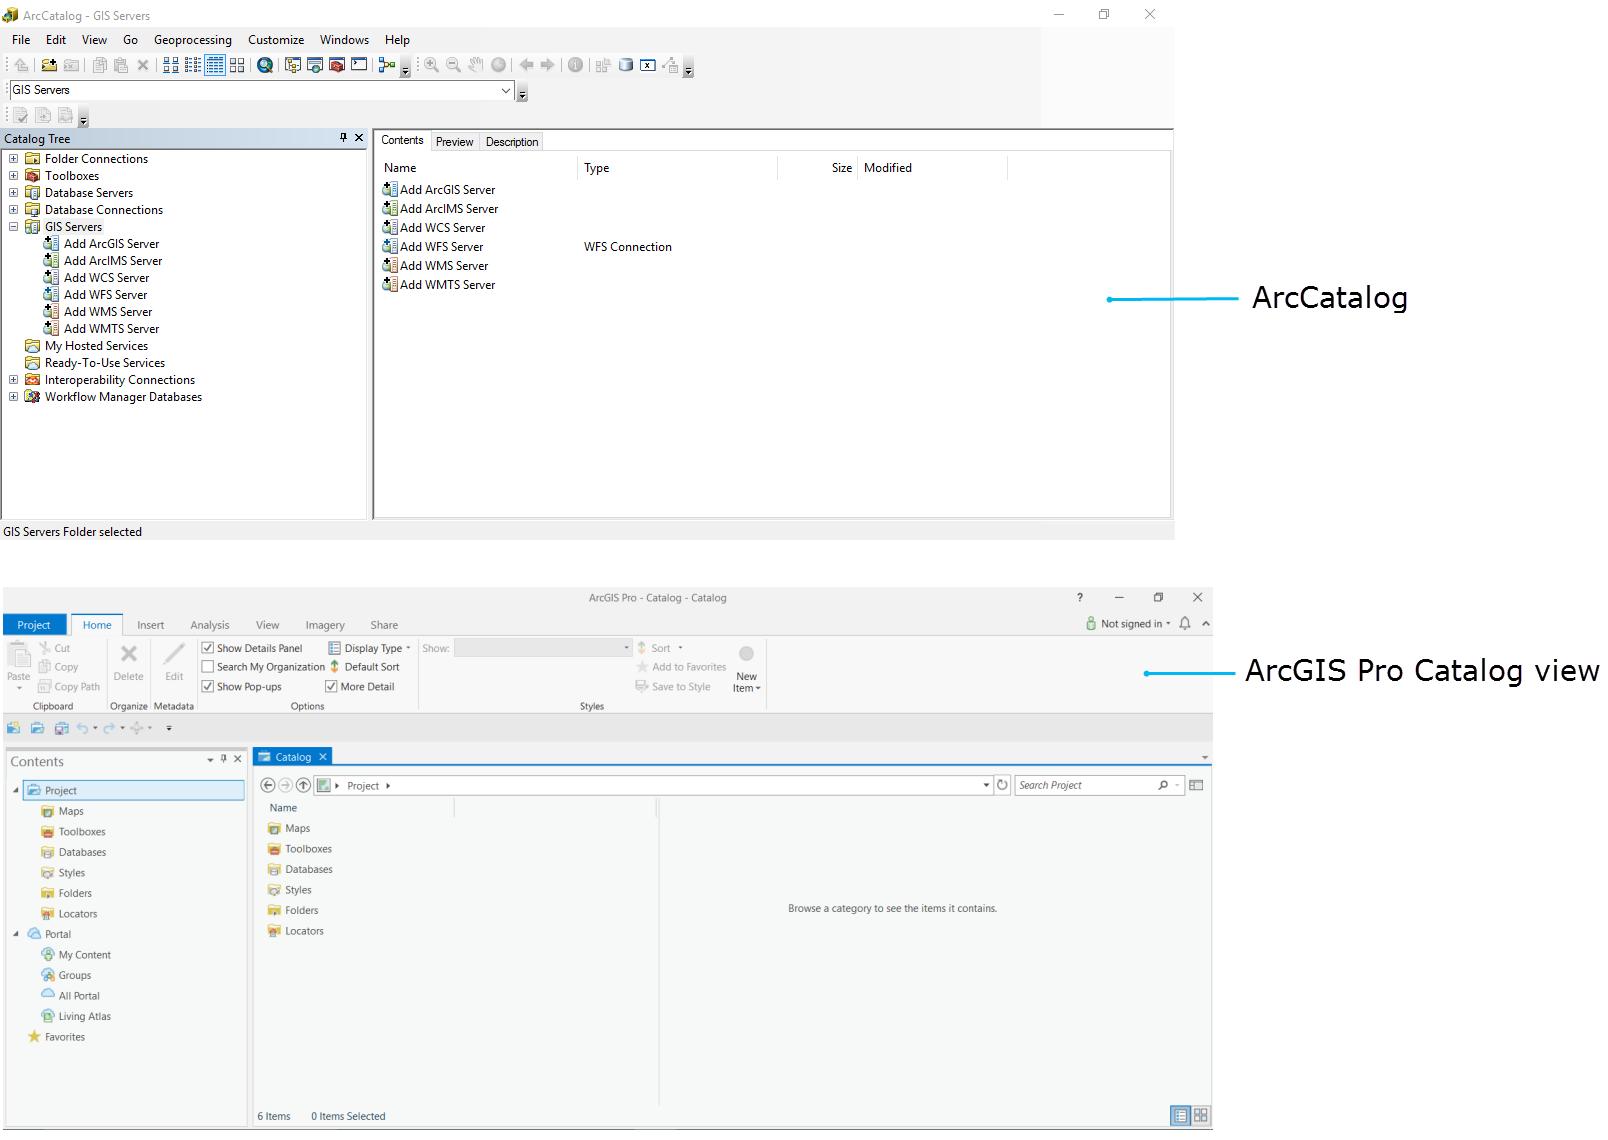 ArcCatalog and ArcMap Catalog view